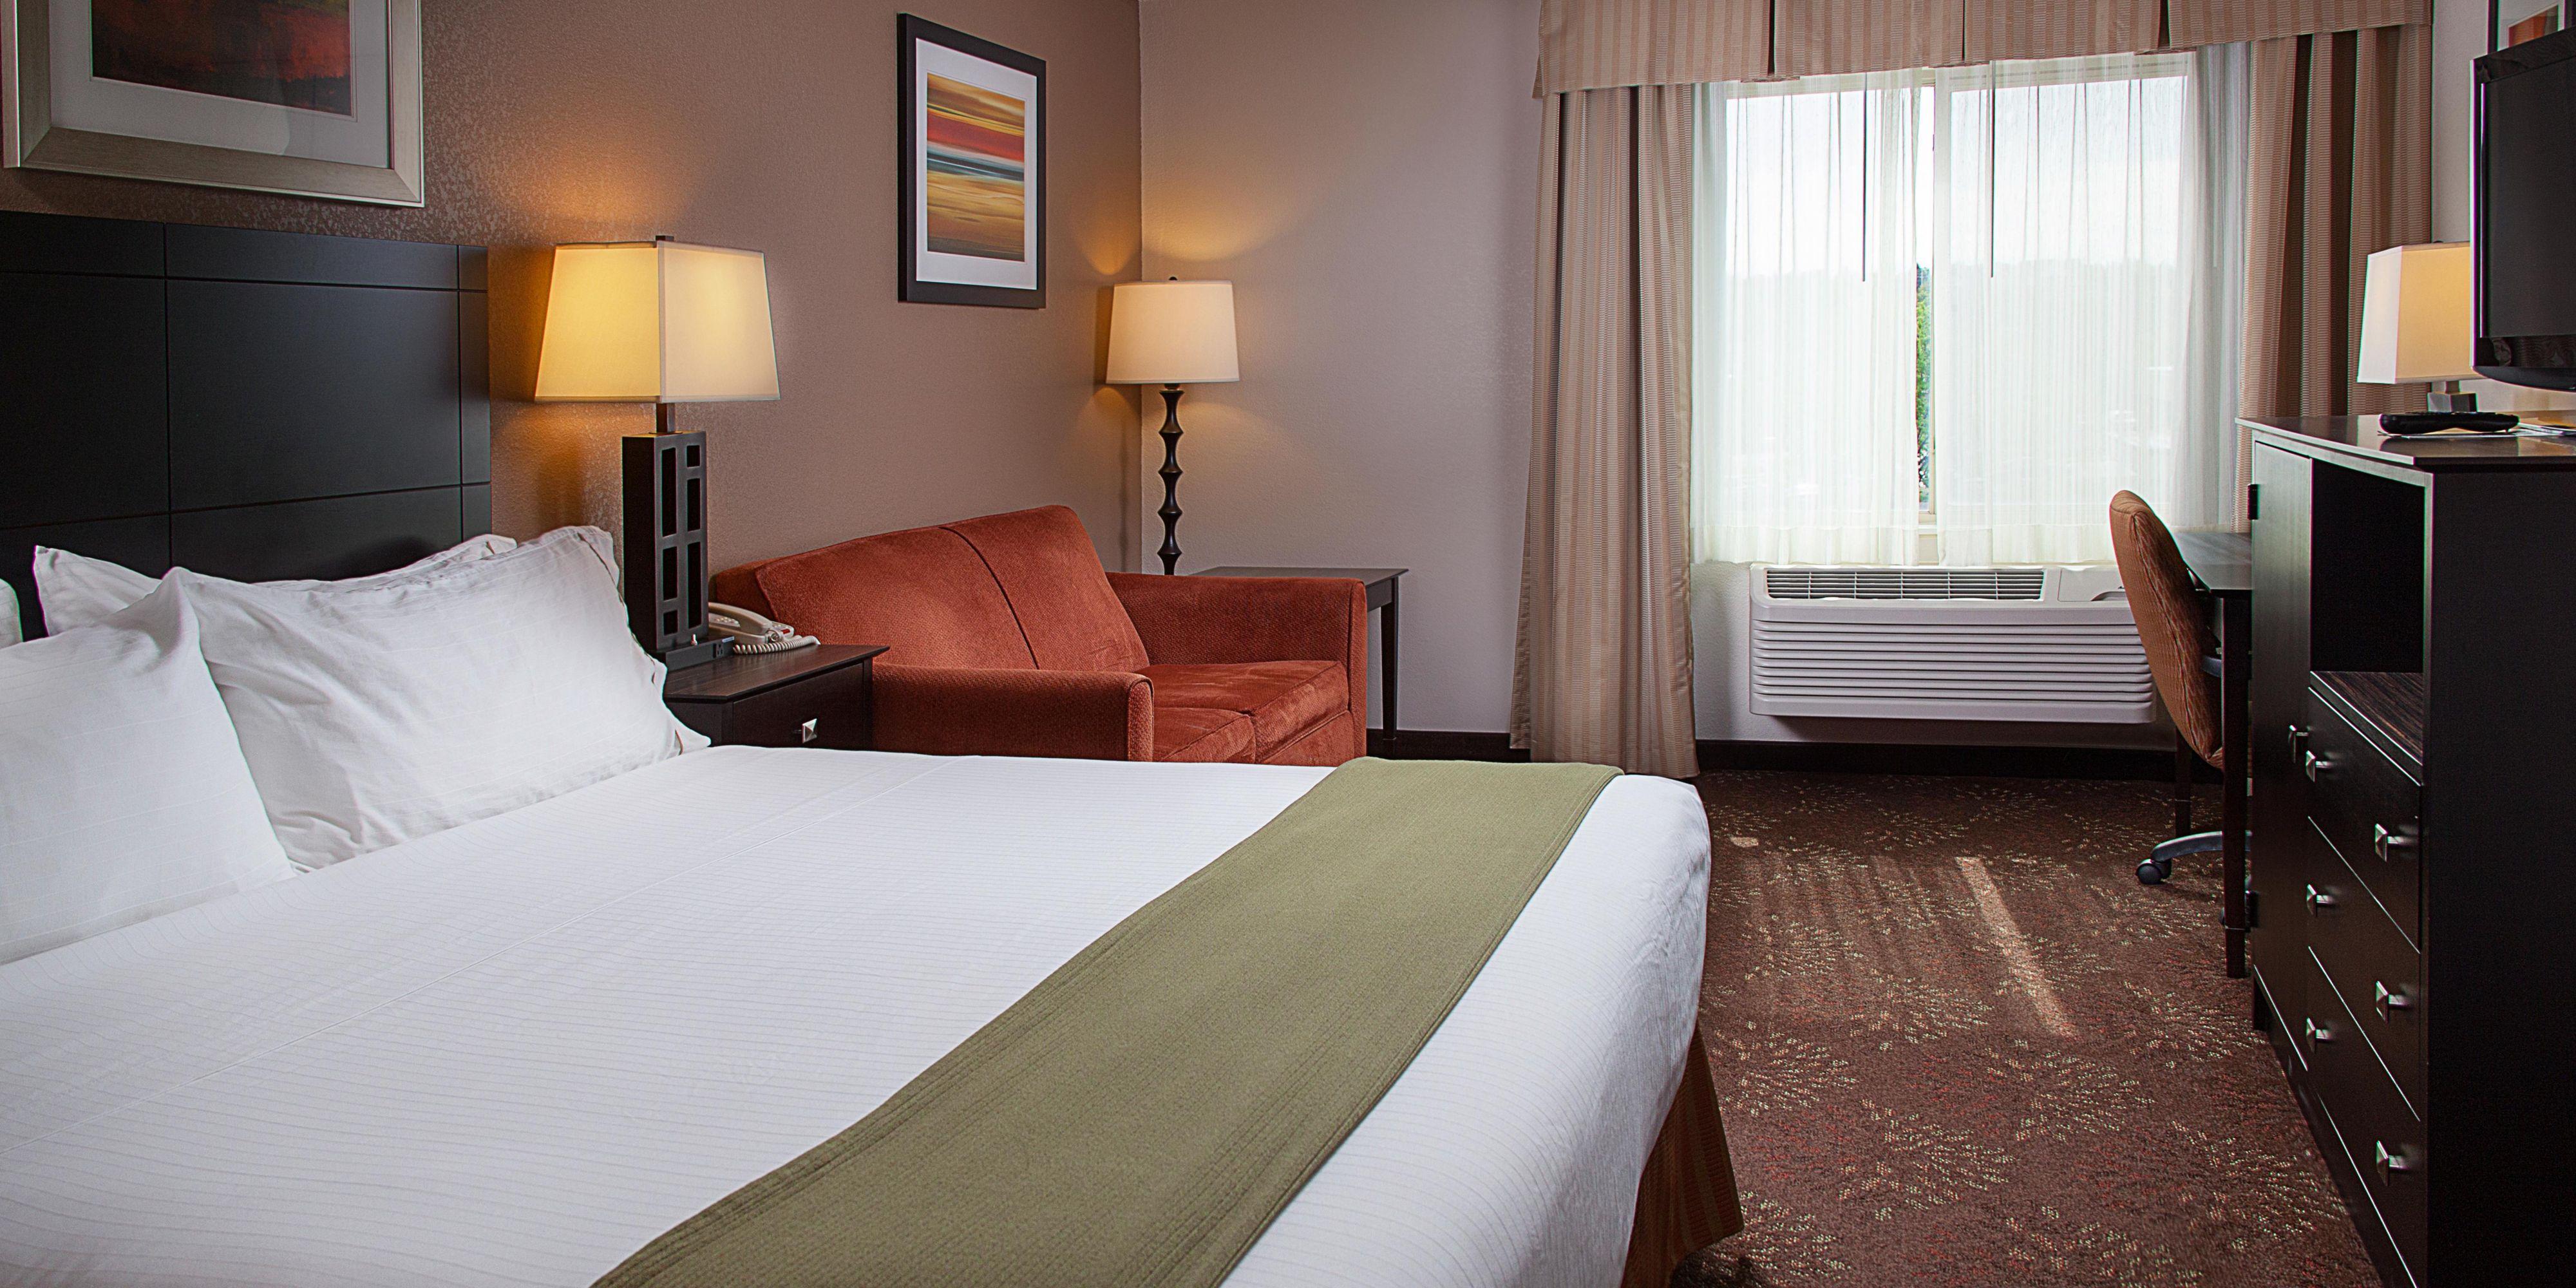 Restful nights pillows comfort inn comfort inn for Comfort inn hotel pillows